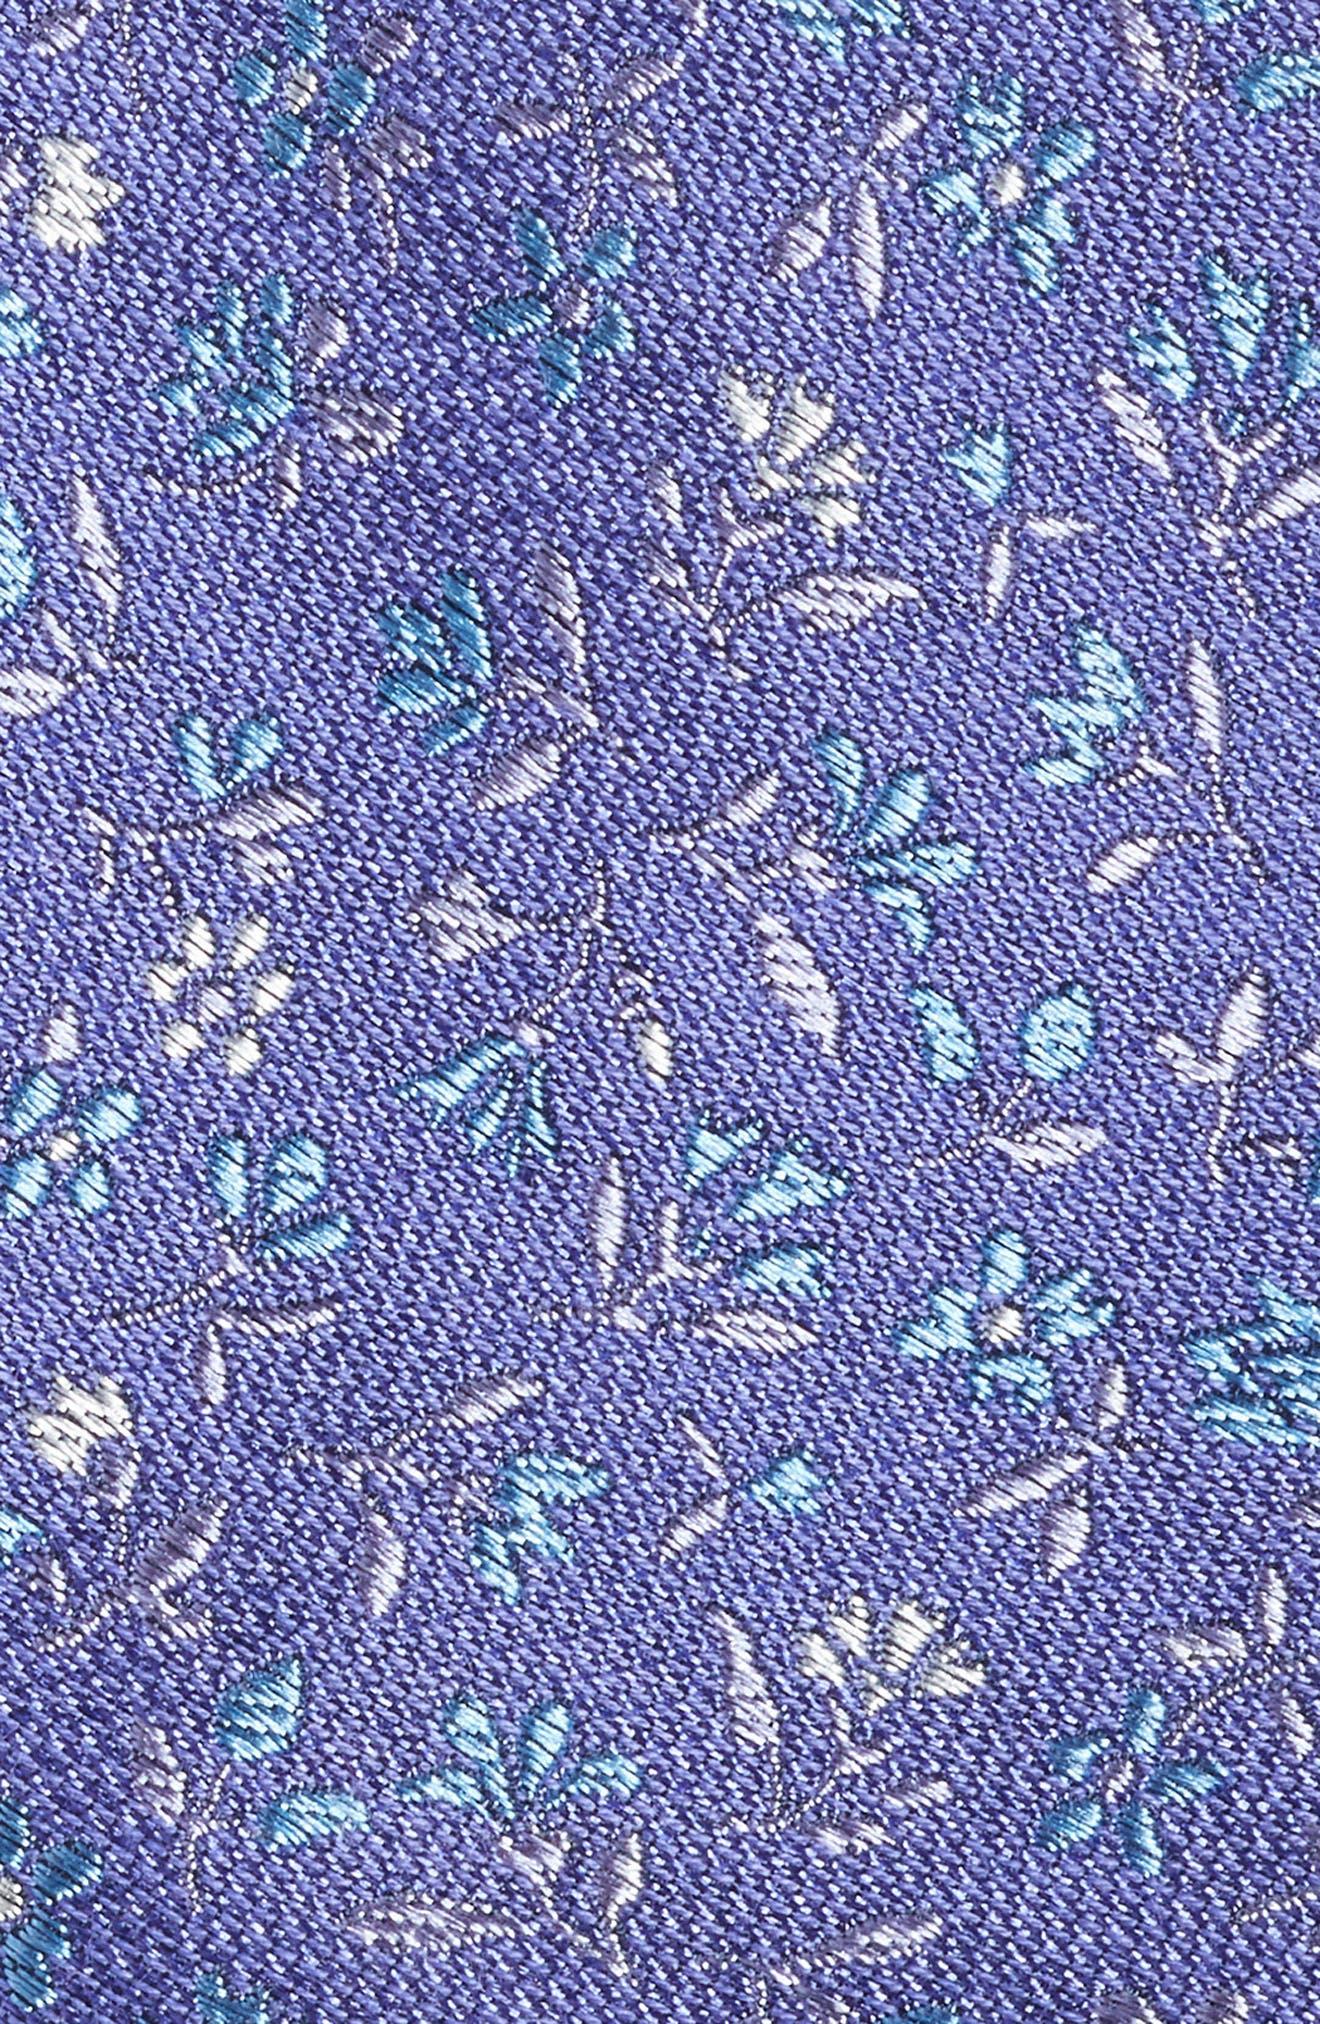 Flower Fields Silk & Cotton Tie,                             Alternate thumbnail 2, color,                             Purple